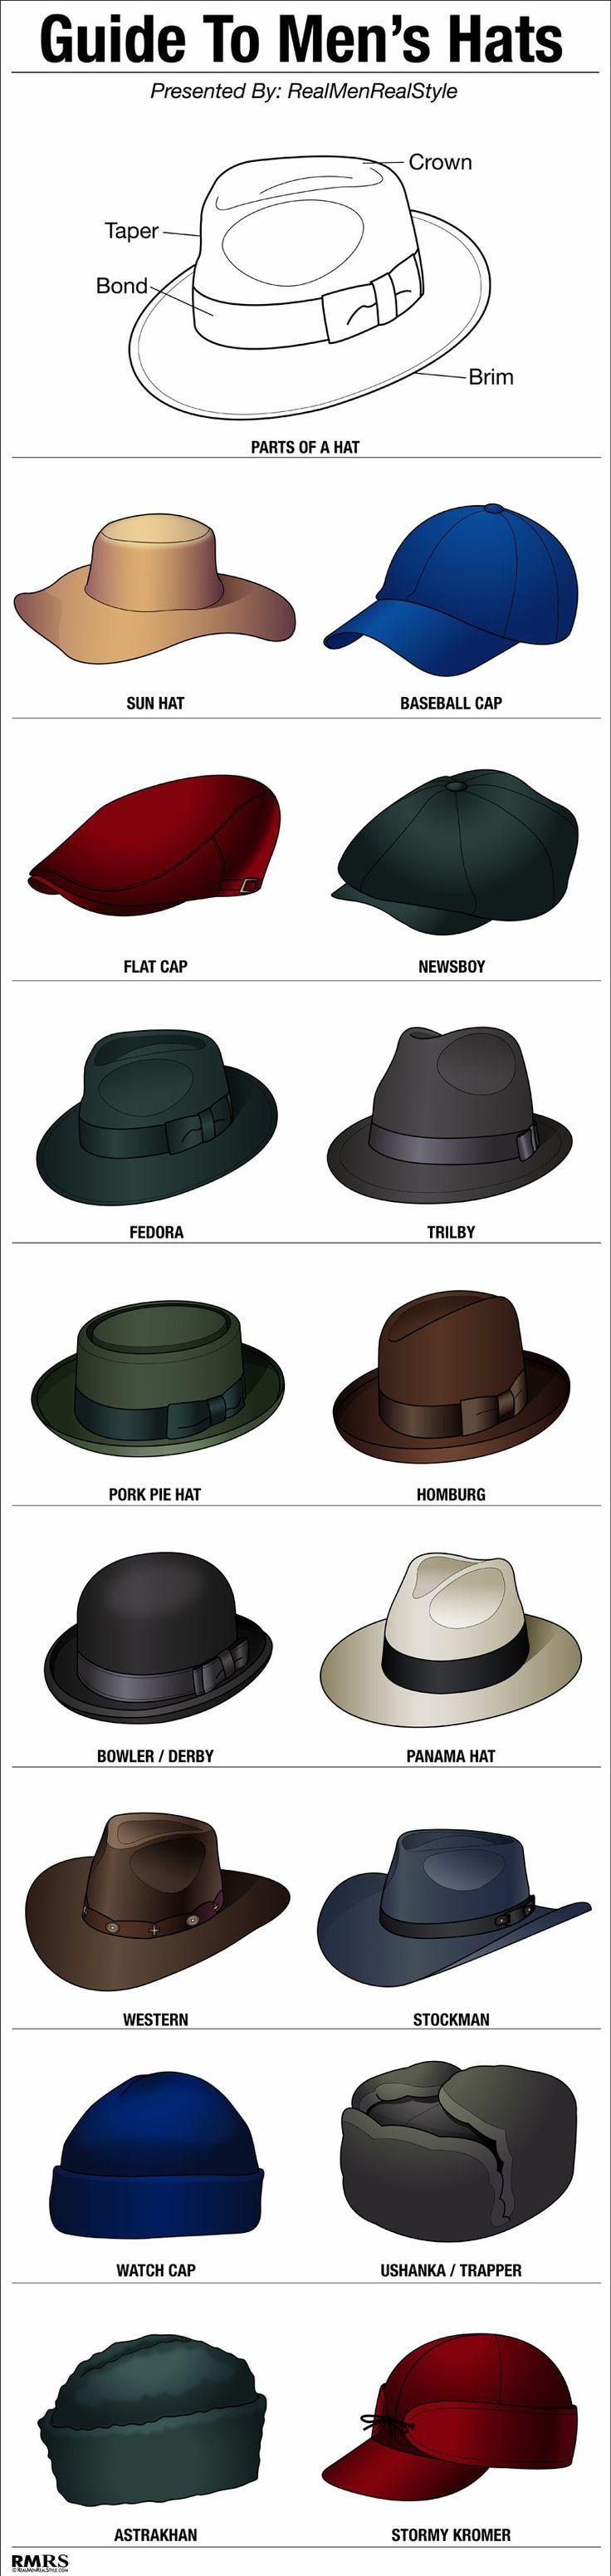 (3) 16 Stylish Men's Hats | Style Guides & Tips | Pinterest